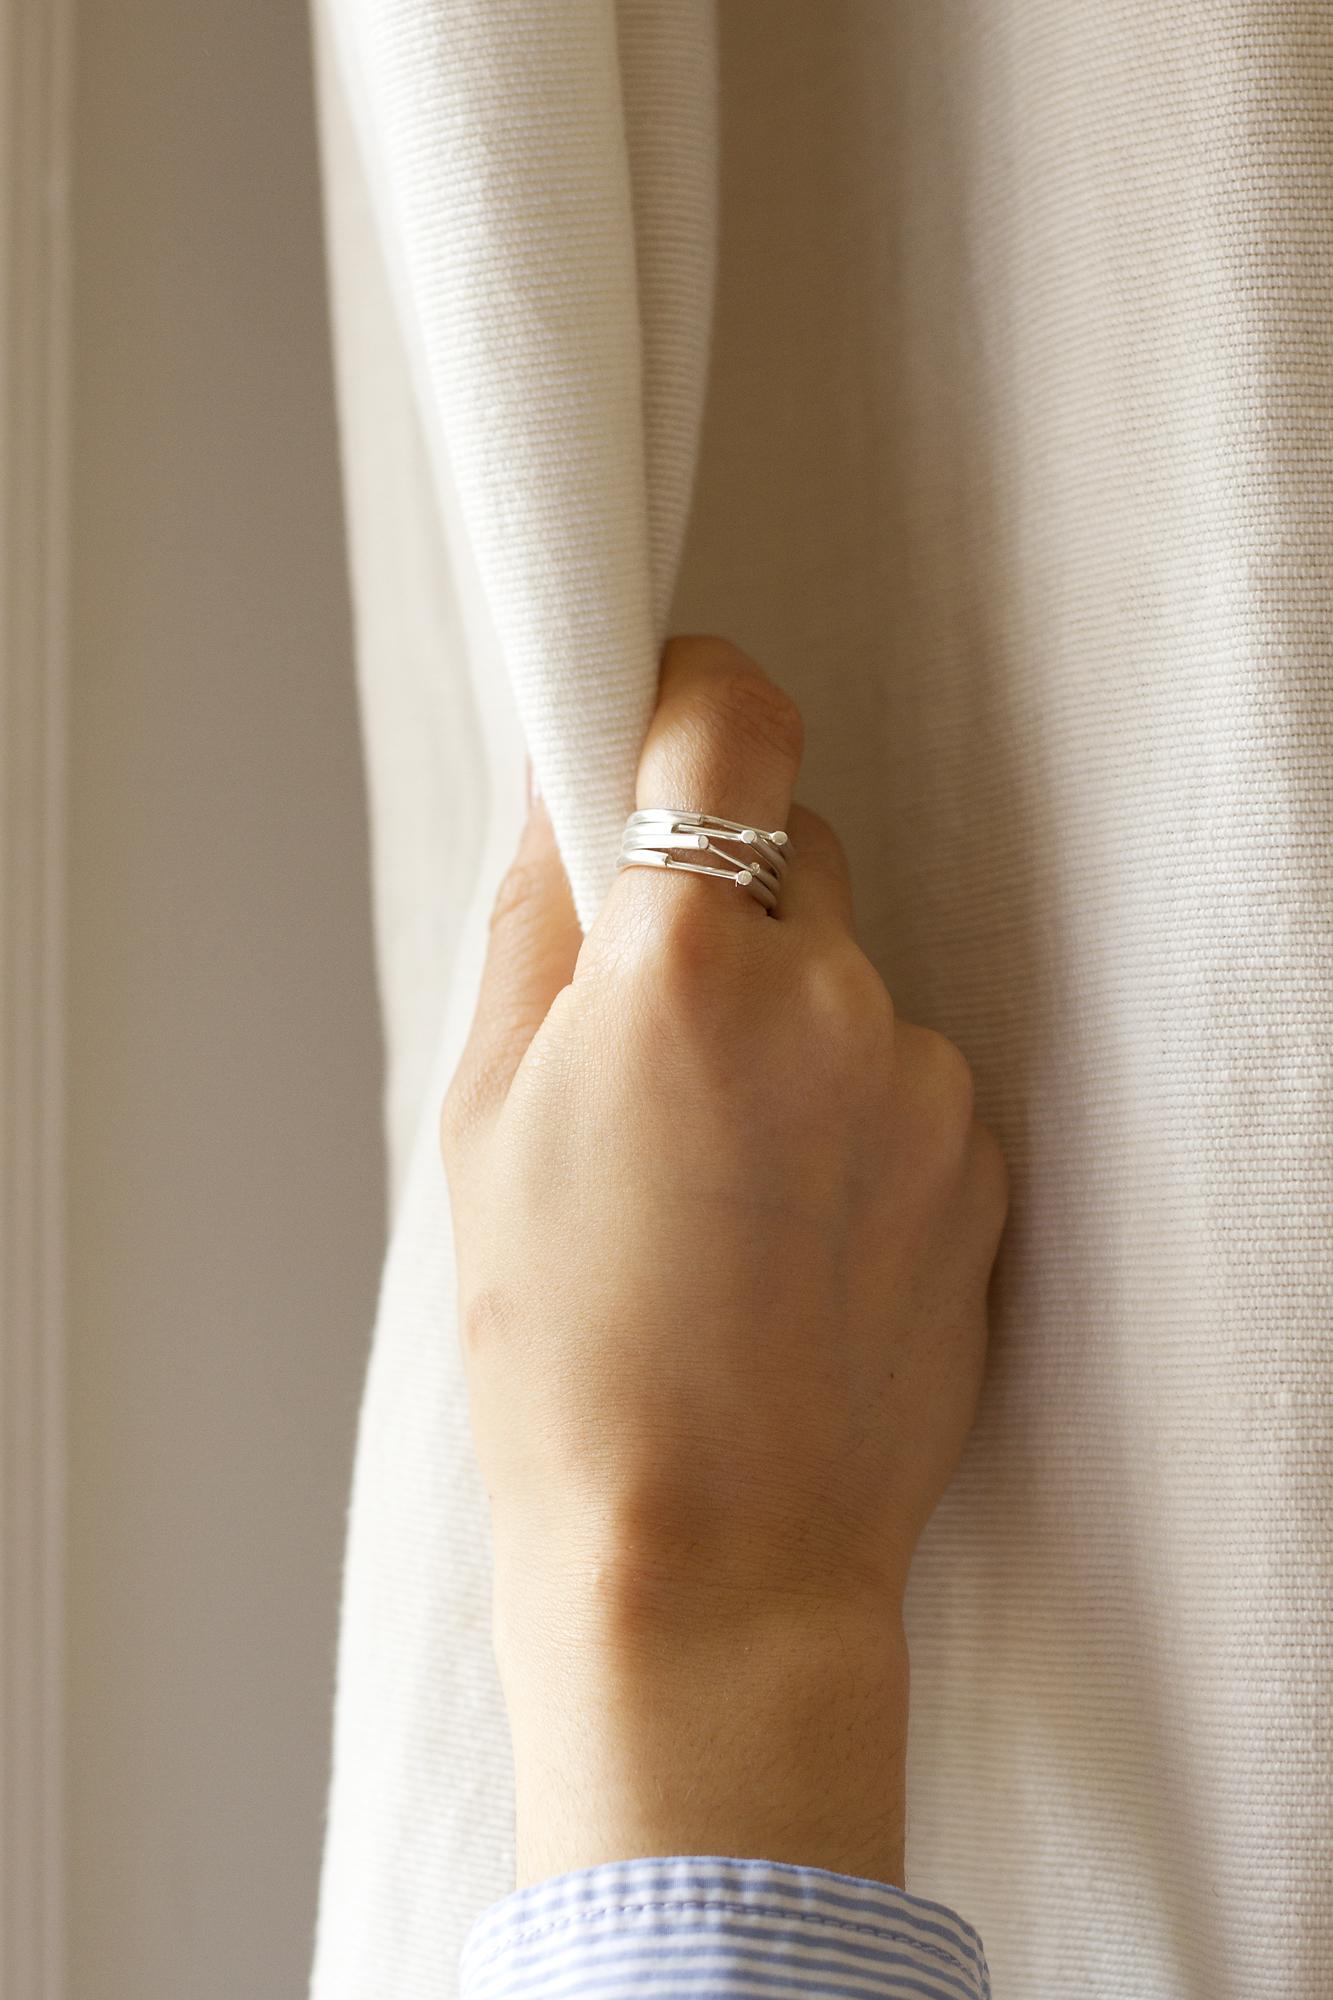 NOOK rings  in silver Photography -Katariina Yli-Malmi Model - Chiara Biscontin MUA - Shelley Yadav